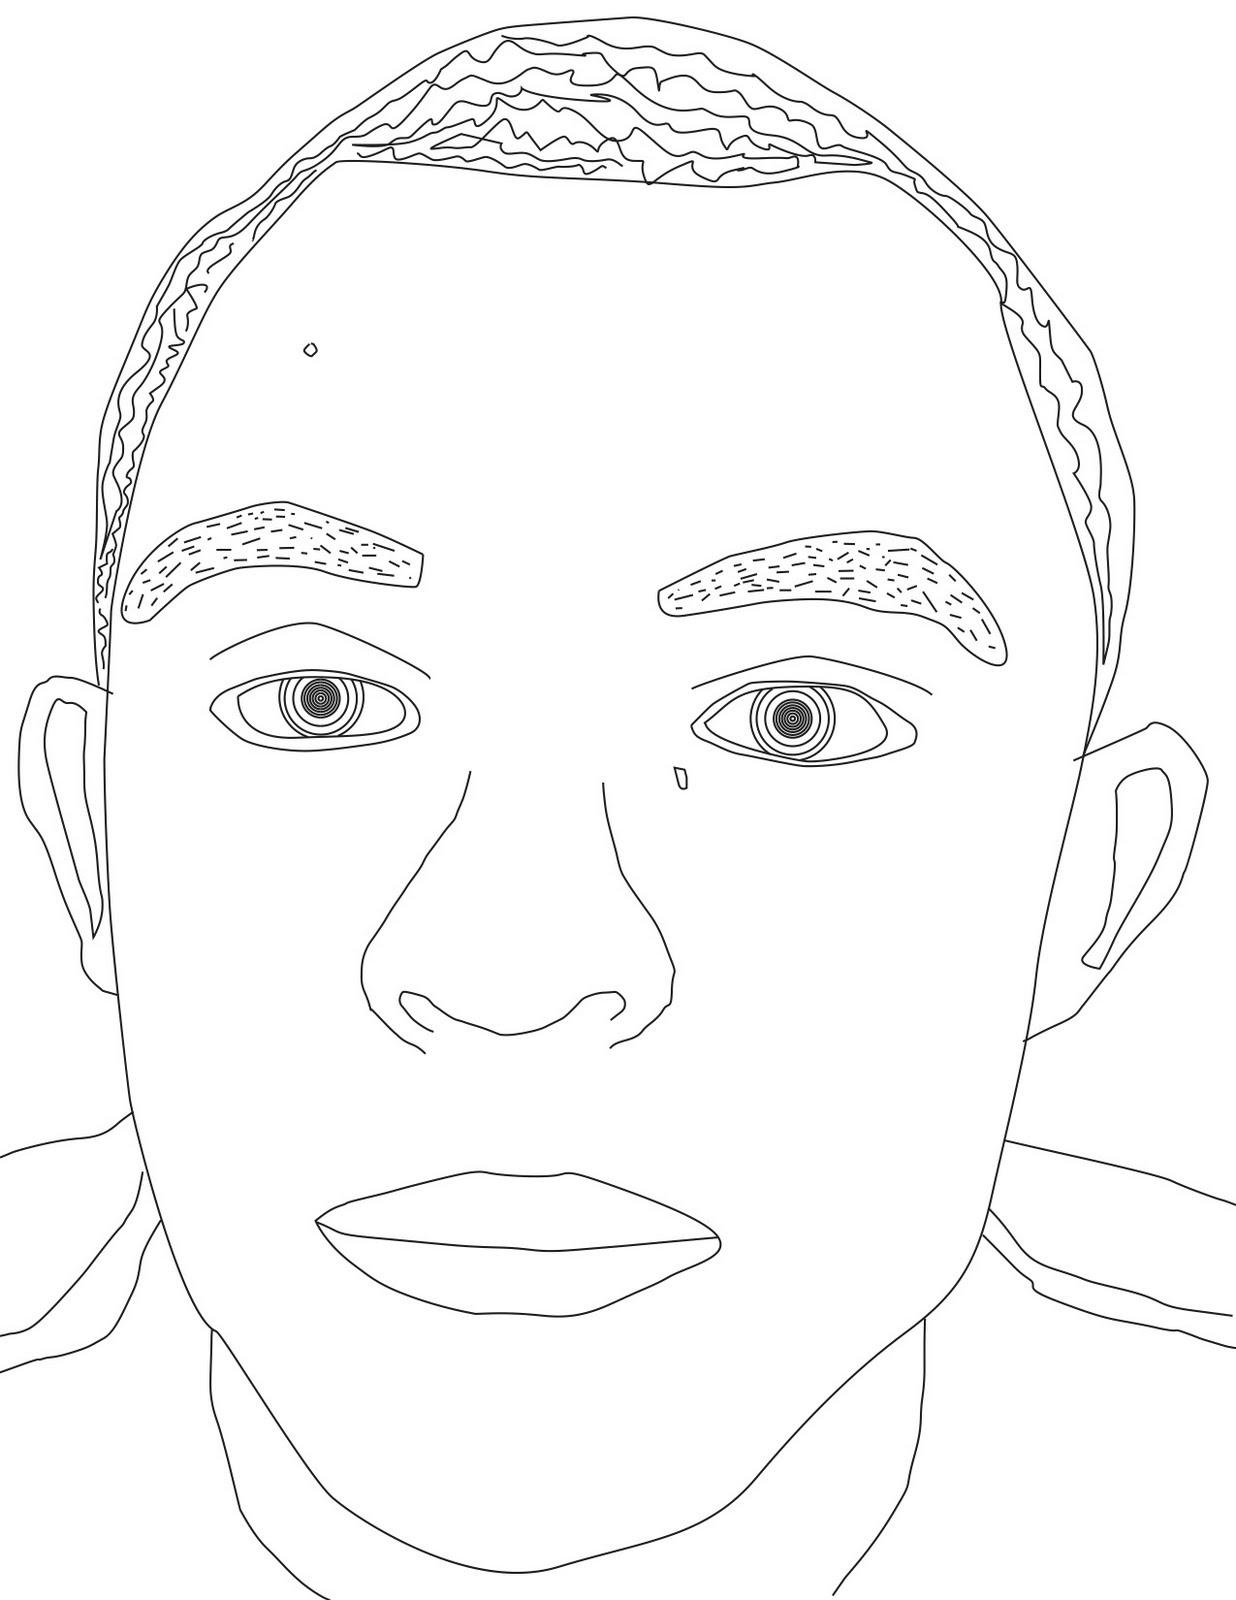 Space Bound: Line self portrait